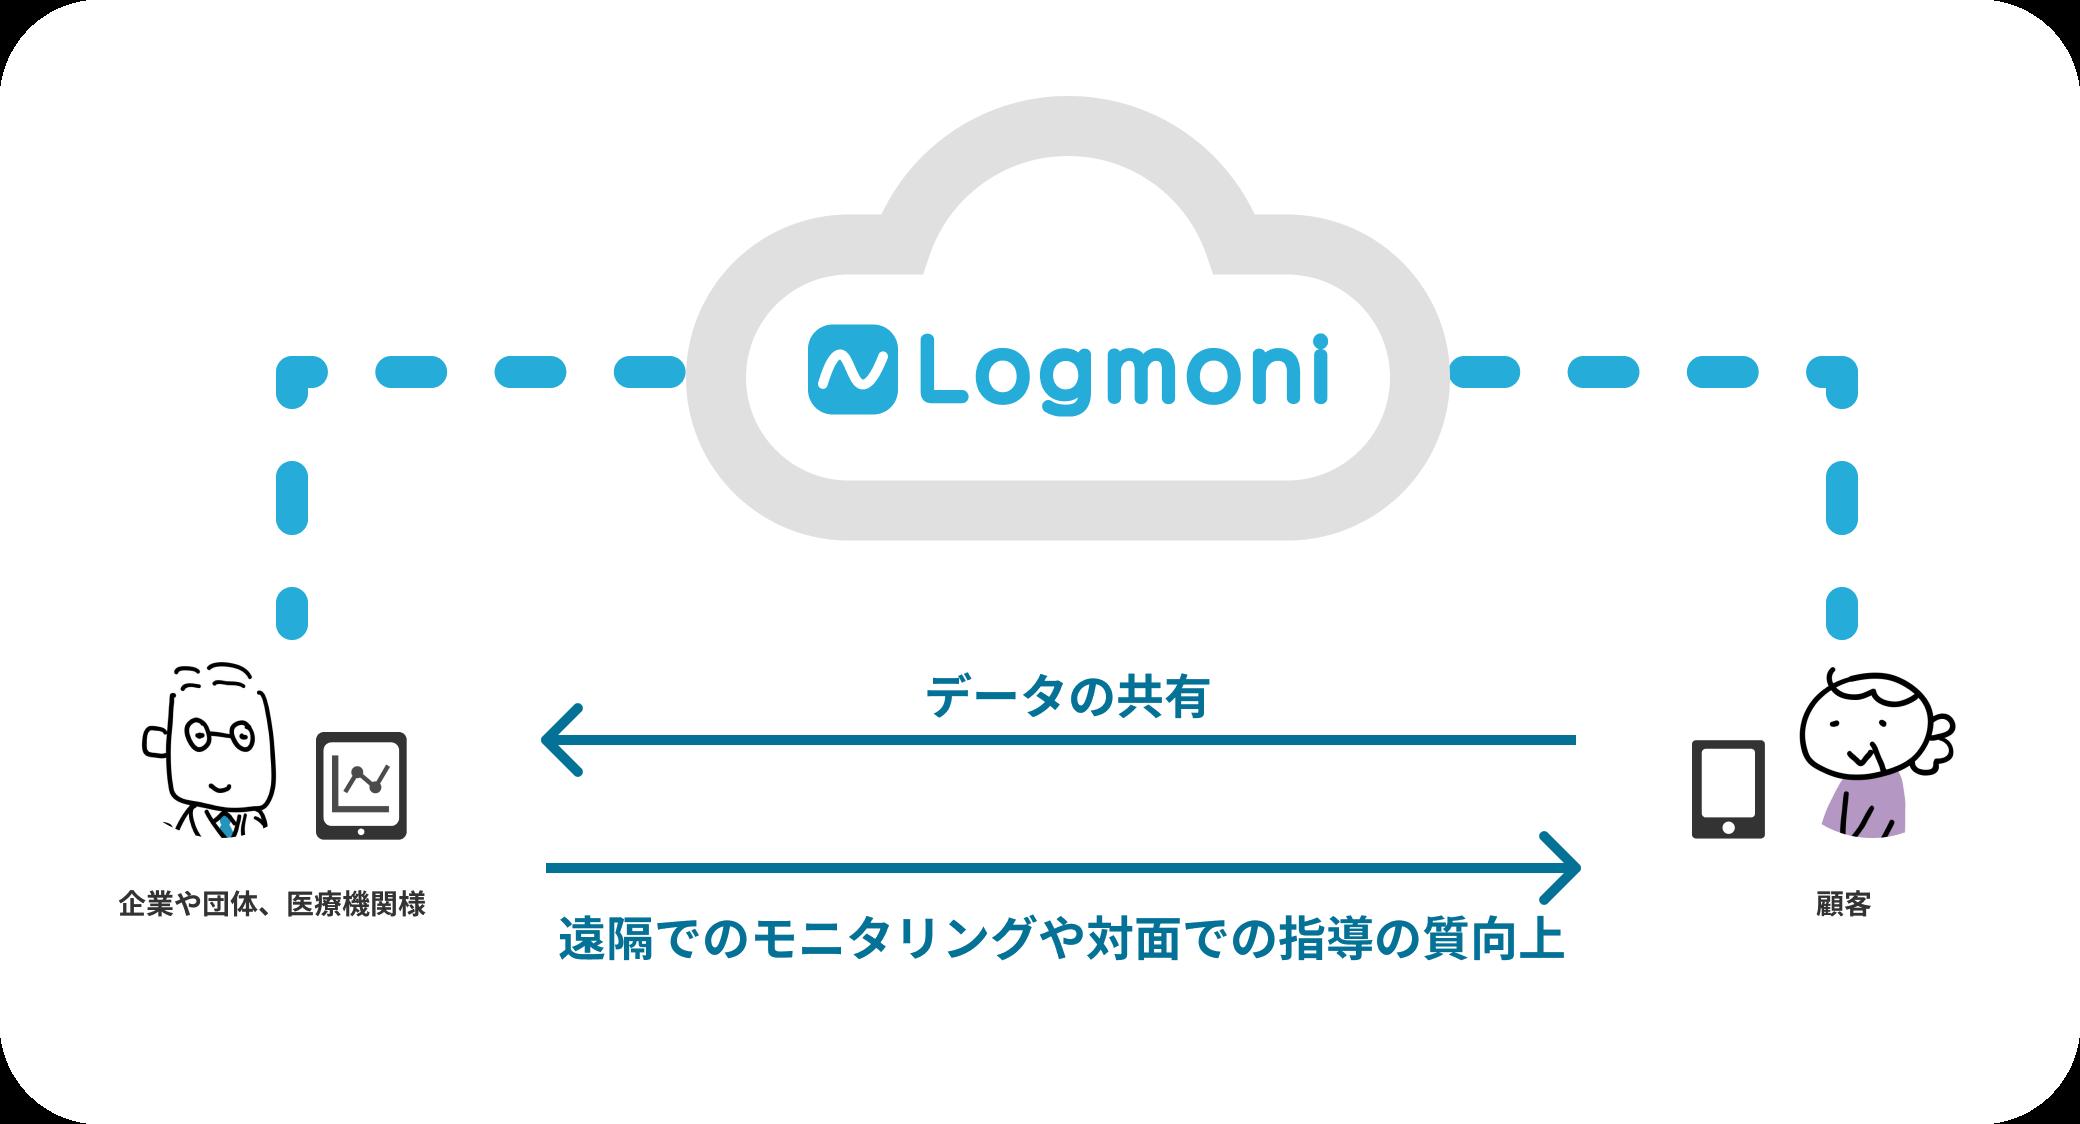 Logmoniサービスイメージ